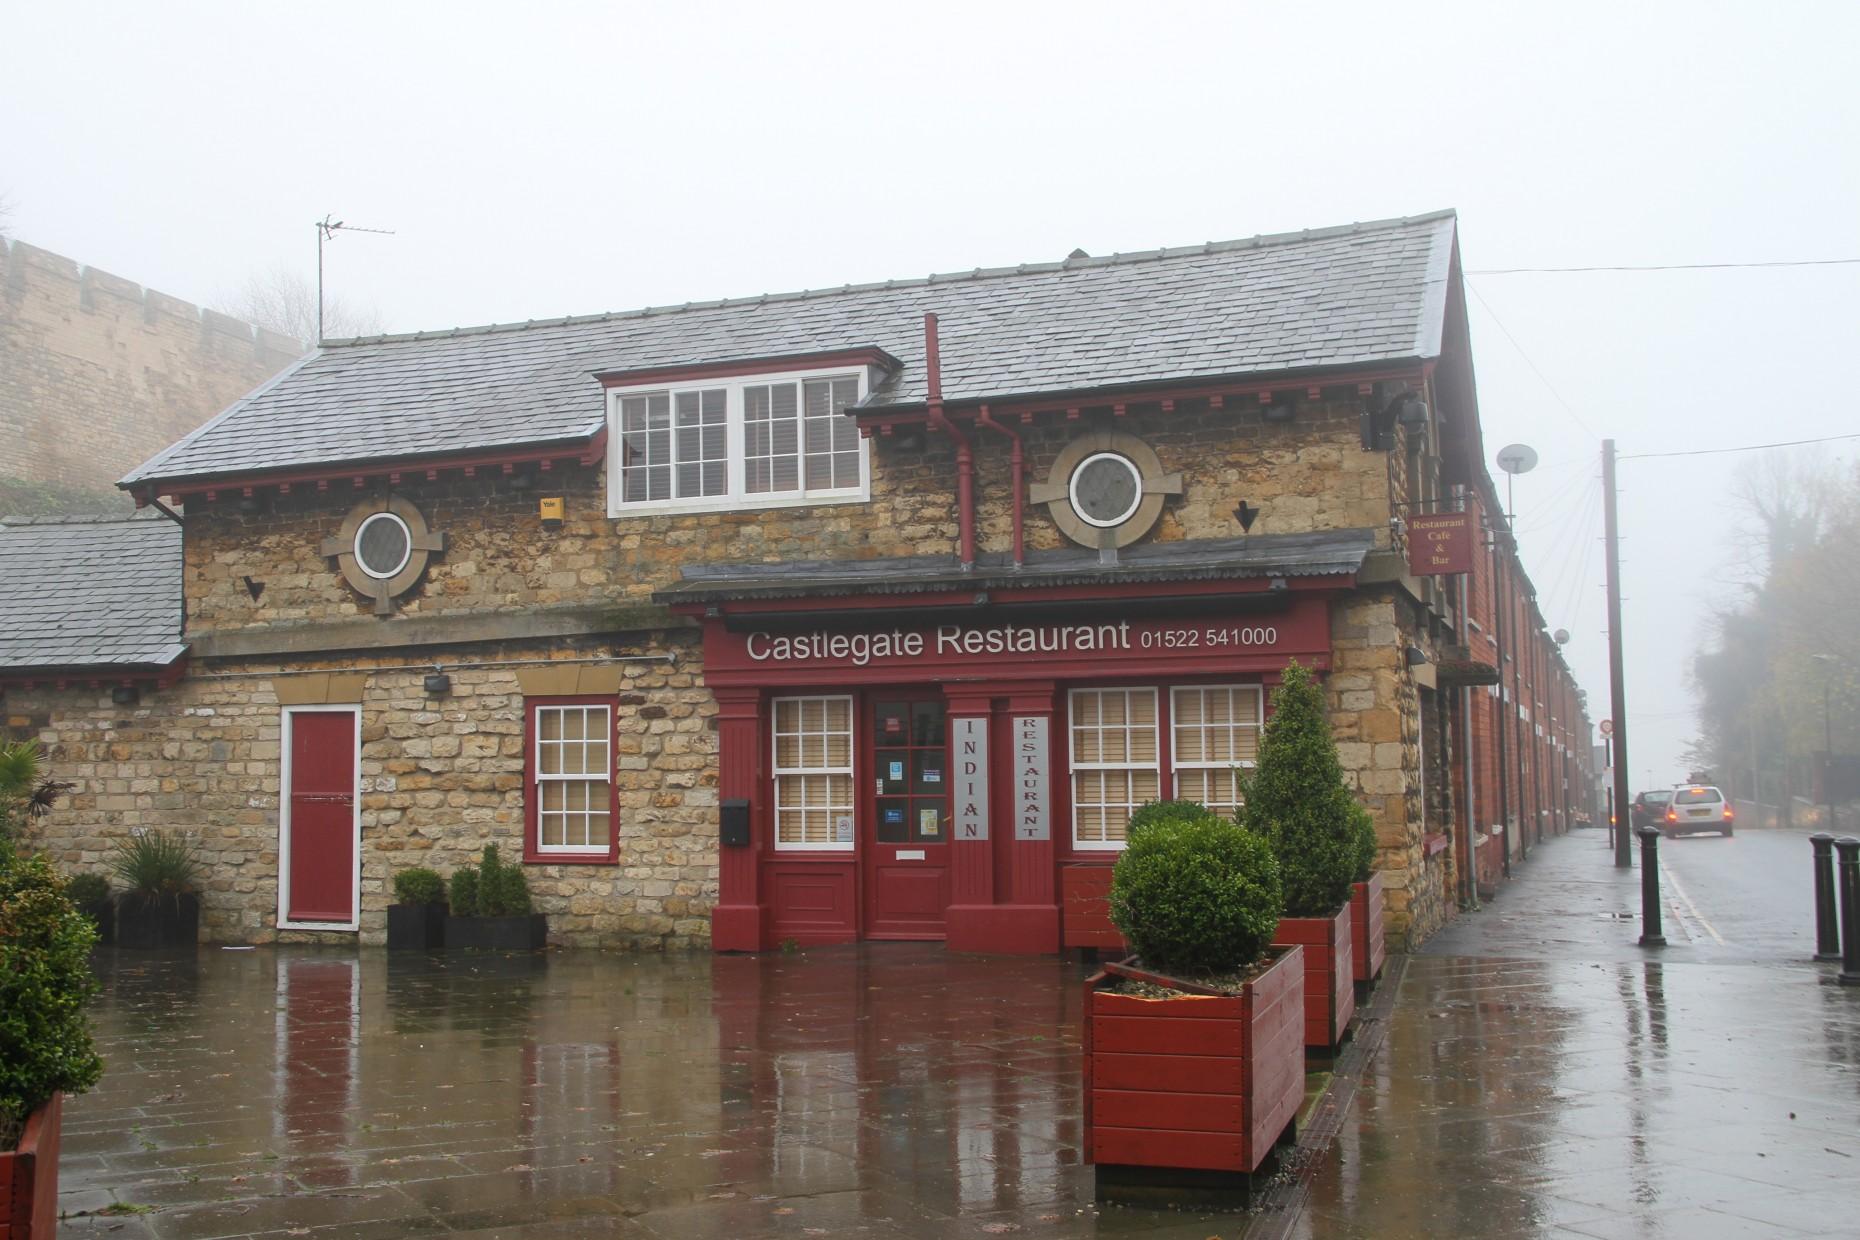 The former Castlegate restaurant in uphill Lincoln. Photo: The Lincolnite